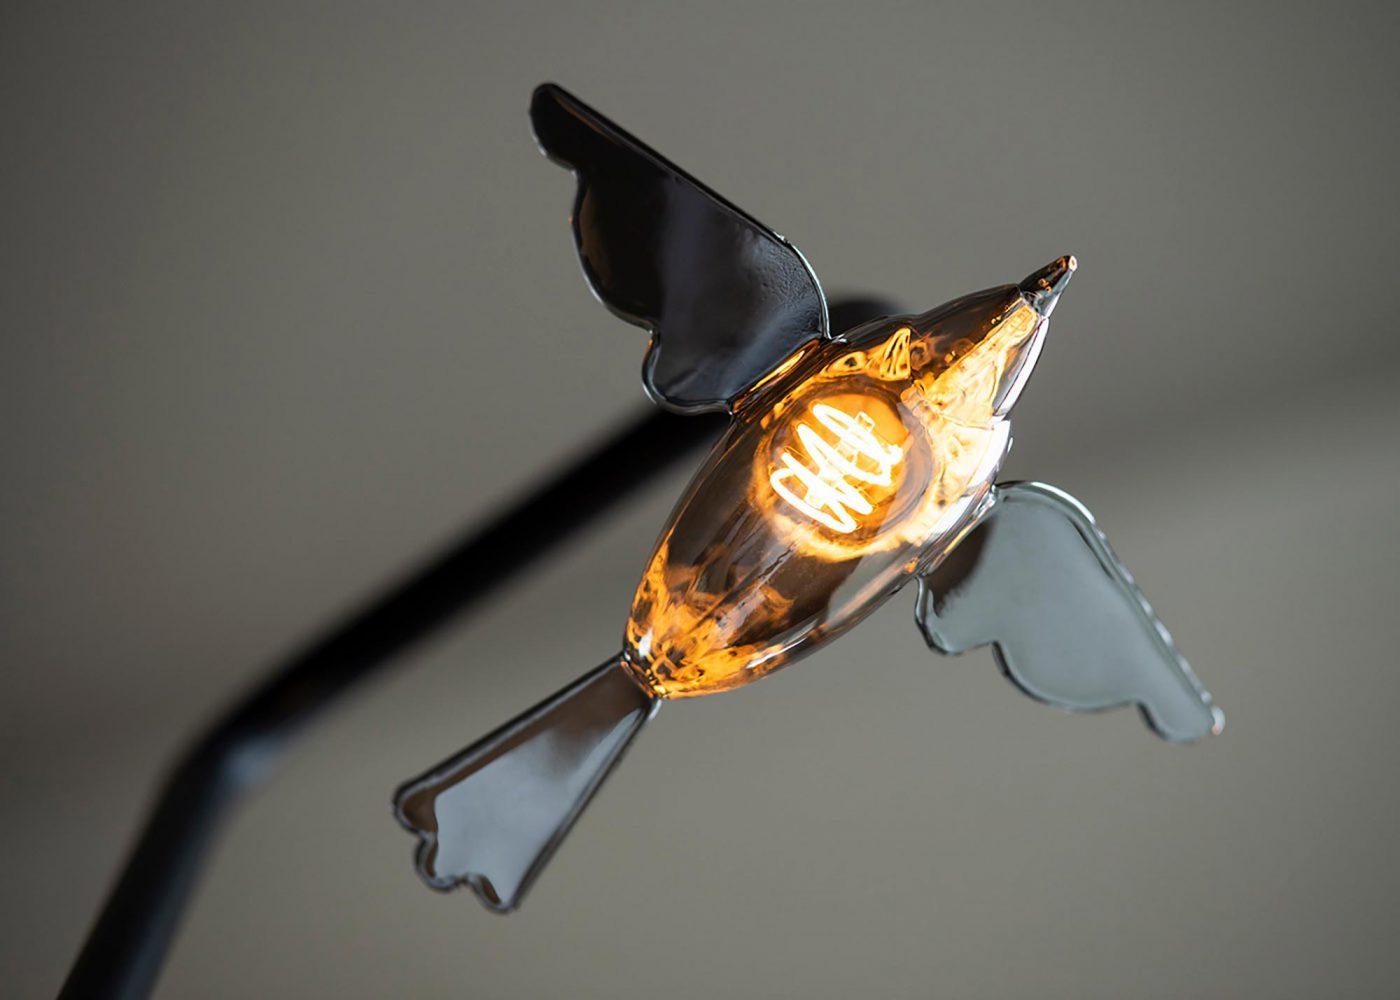 LED bird Bailey 3D ontwerp JAgd 4